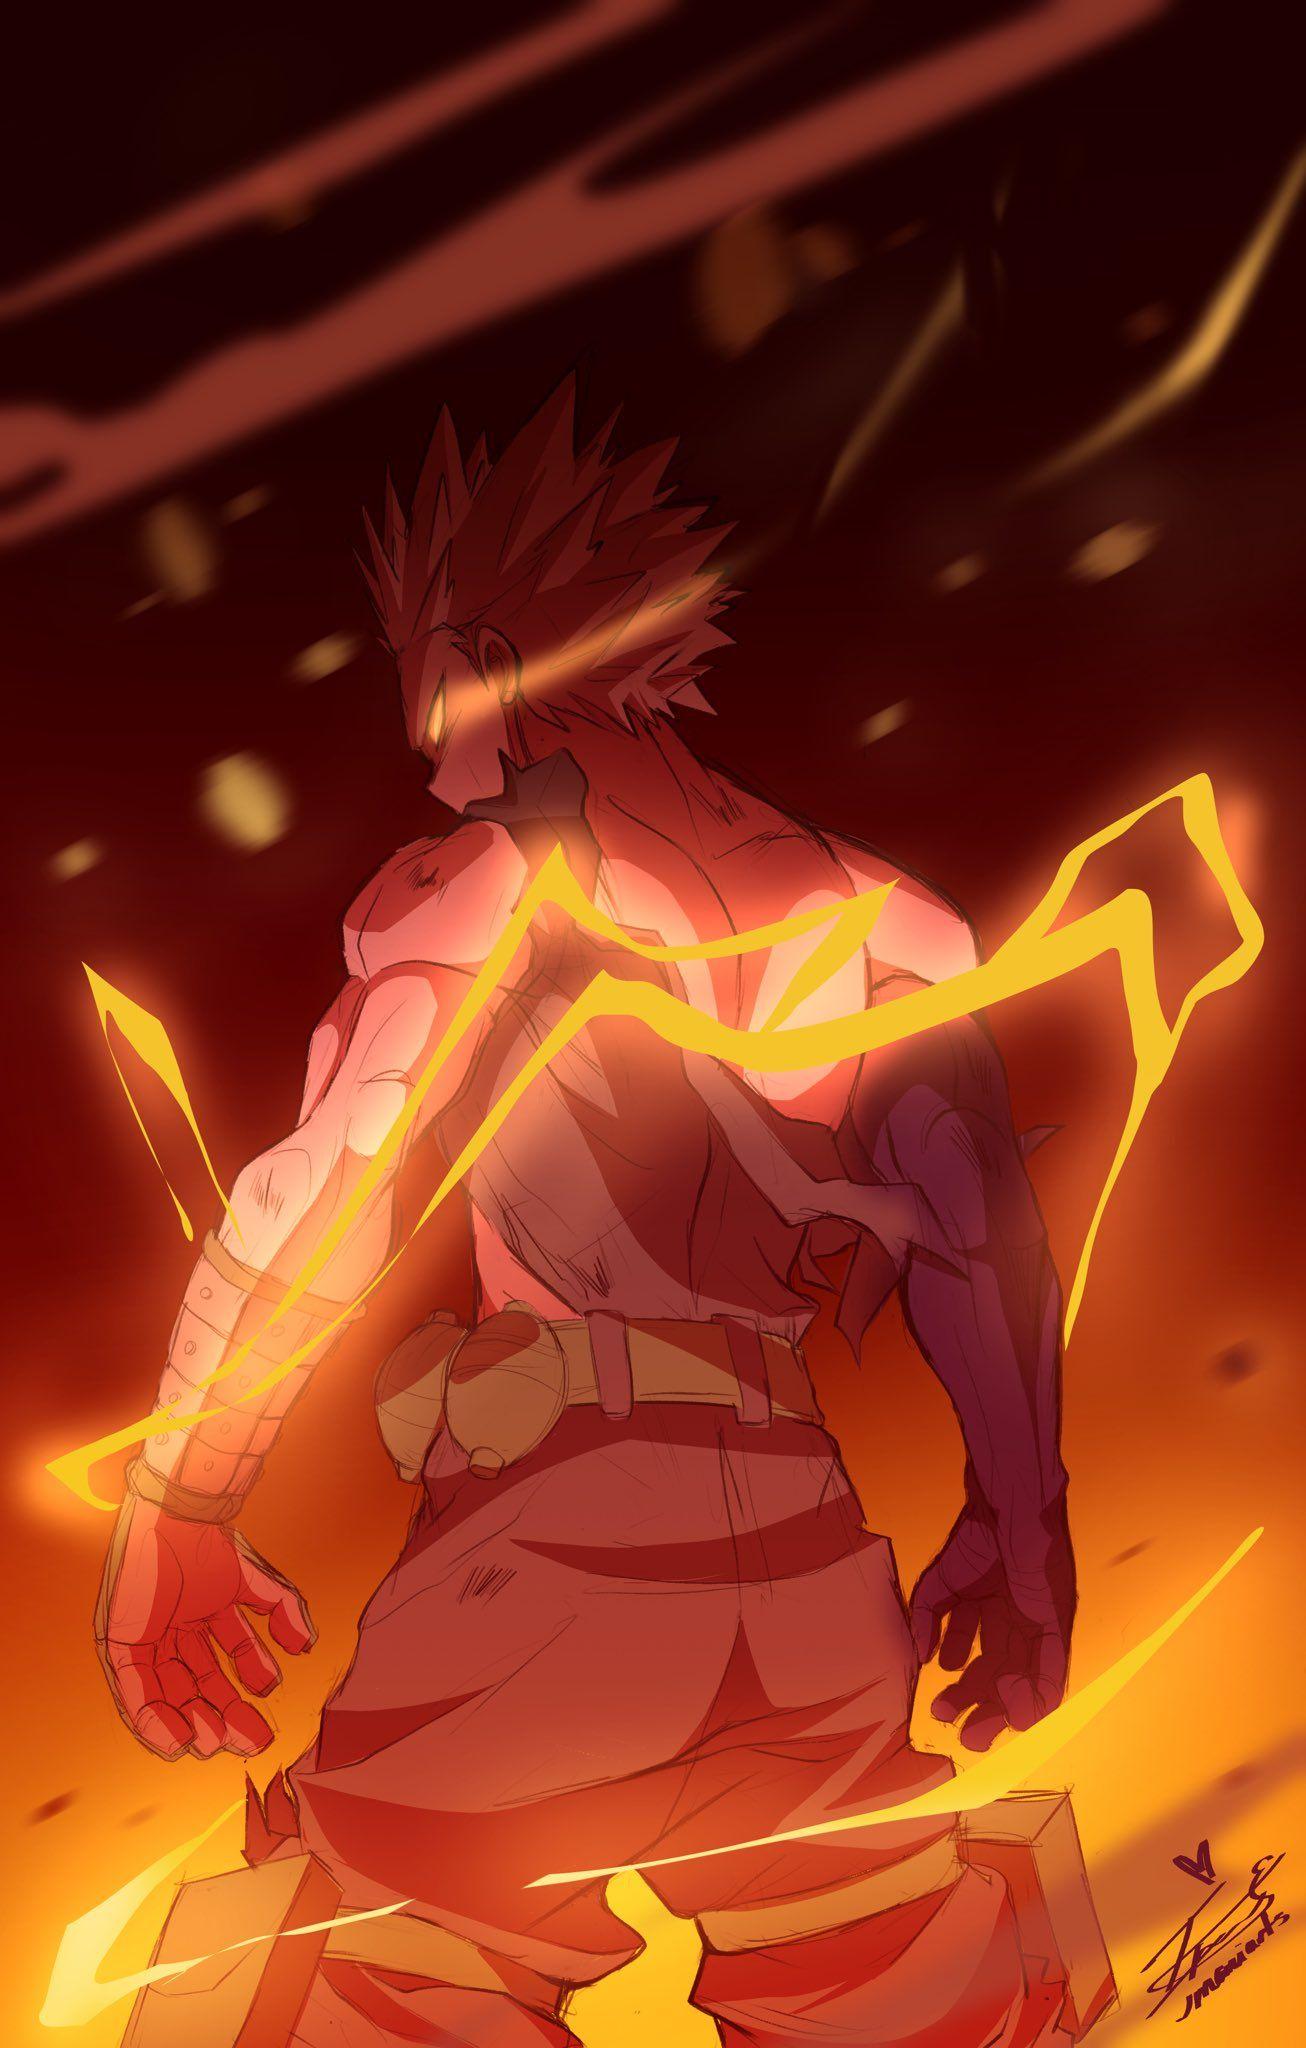 Imani On Twitter Hero Wallpaper My Hero Academia Episodes Anime Wallpaper